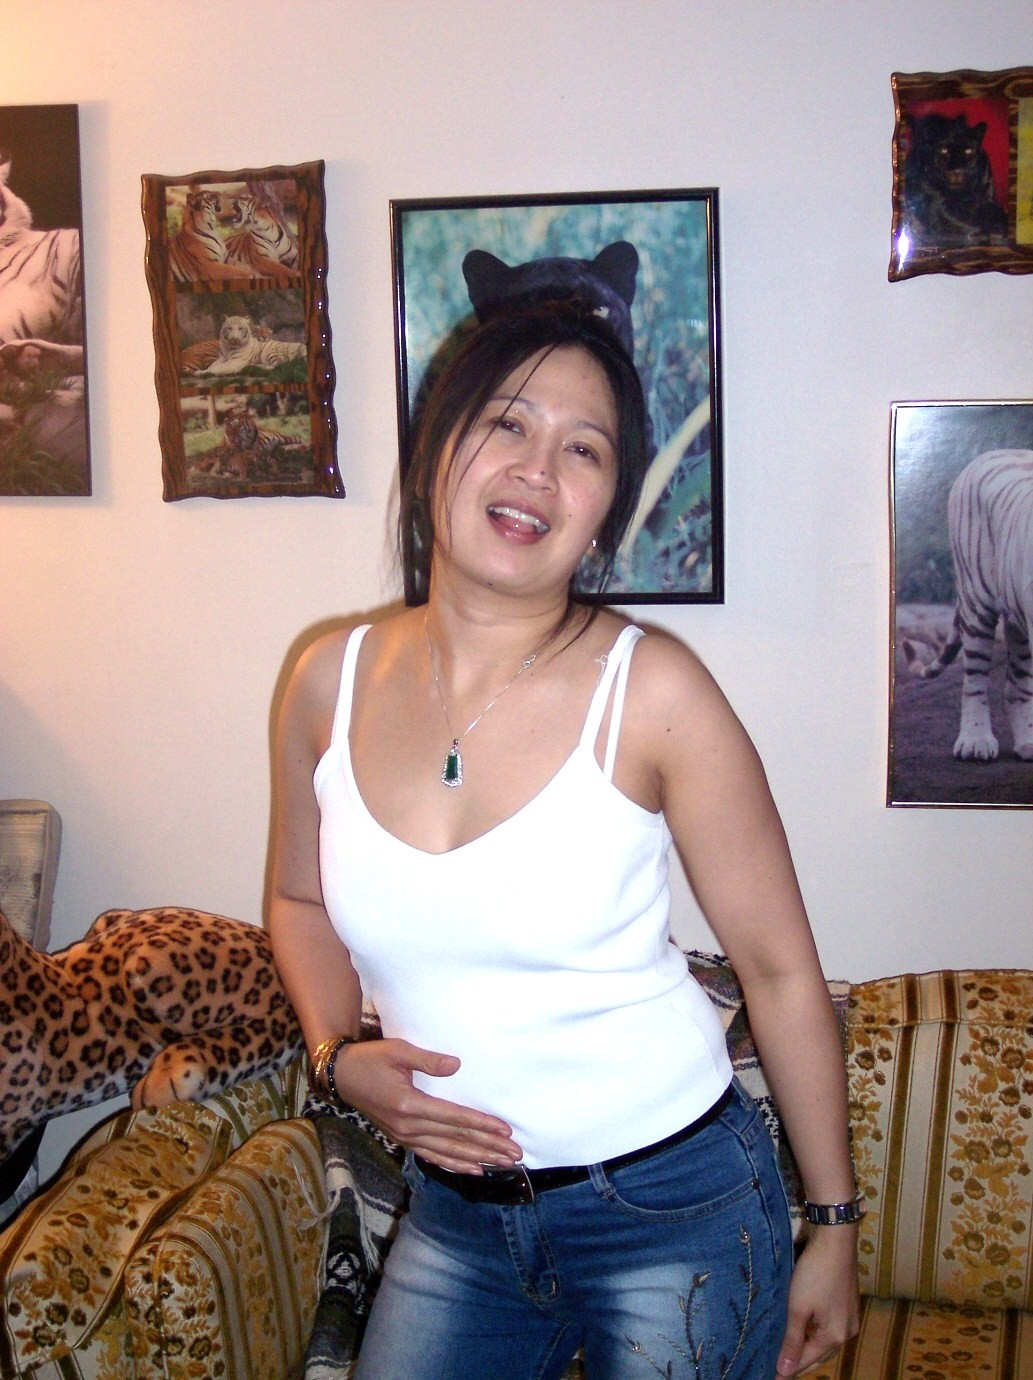 Pinay mature milf . XXX Sex Images. Comments: 1